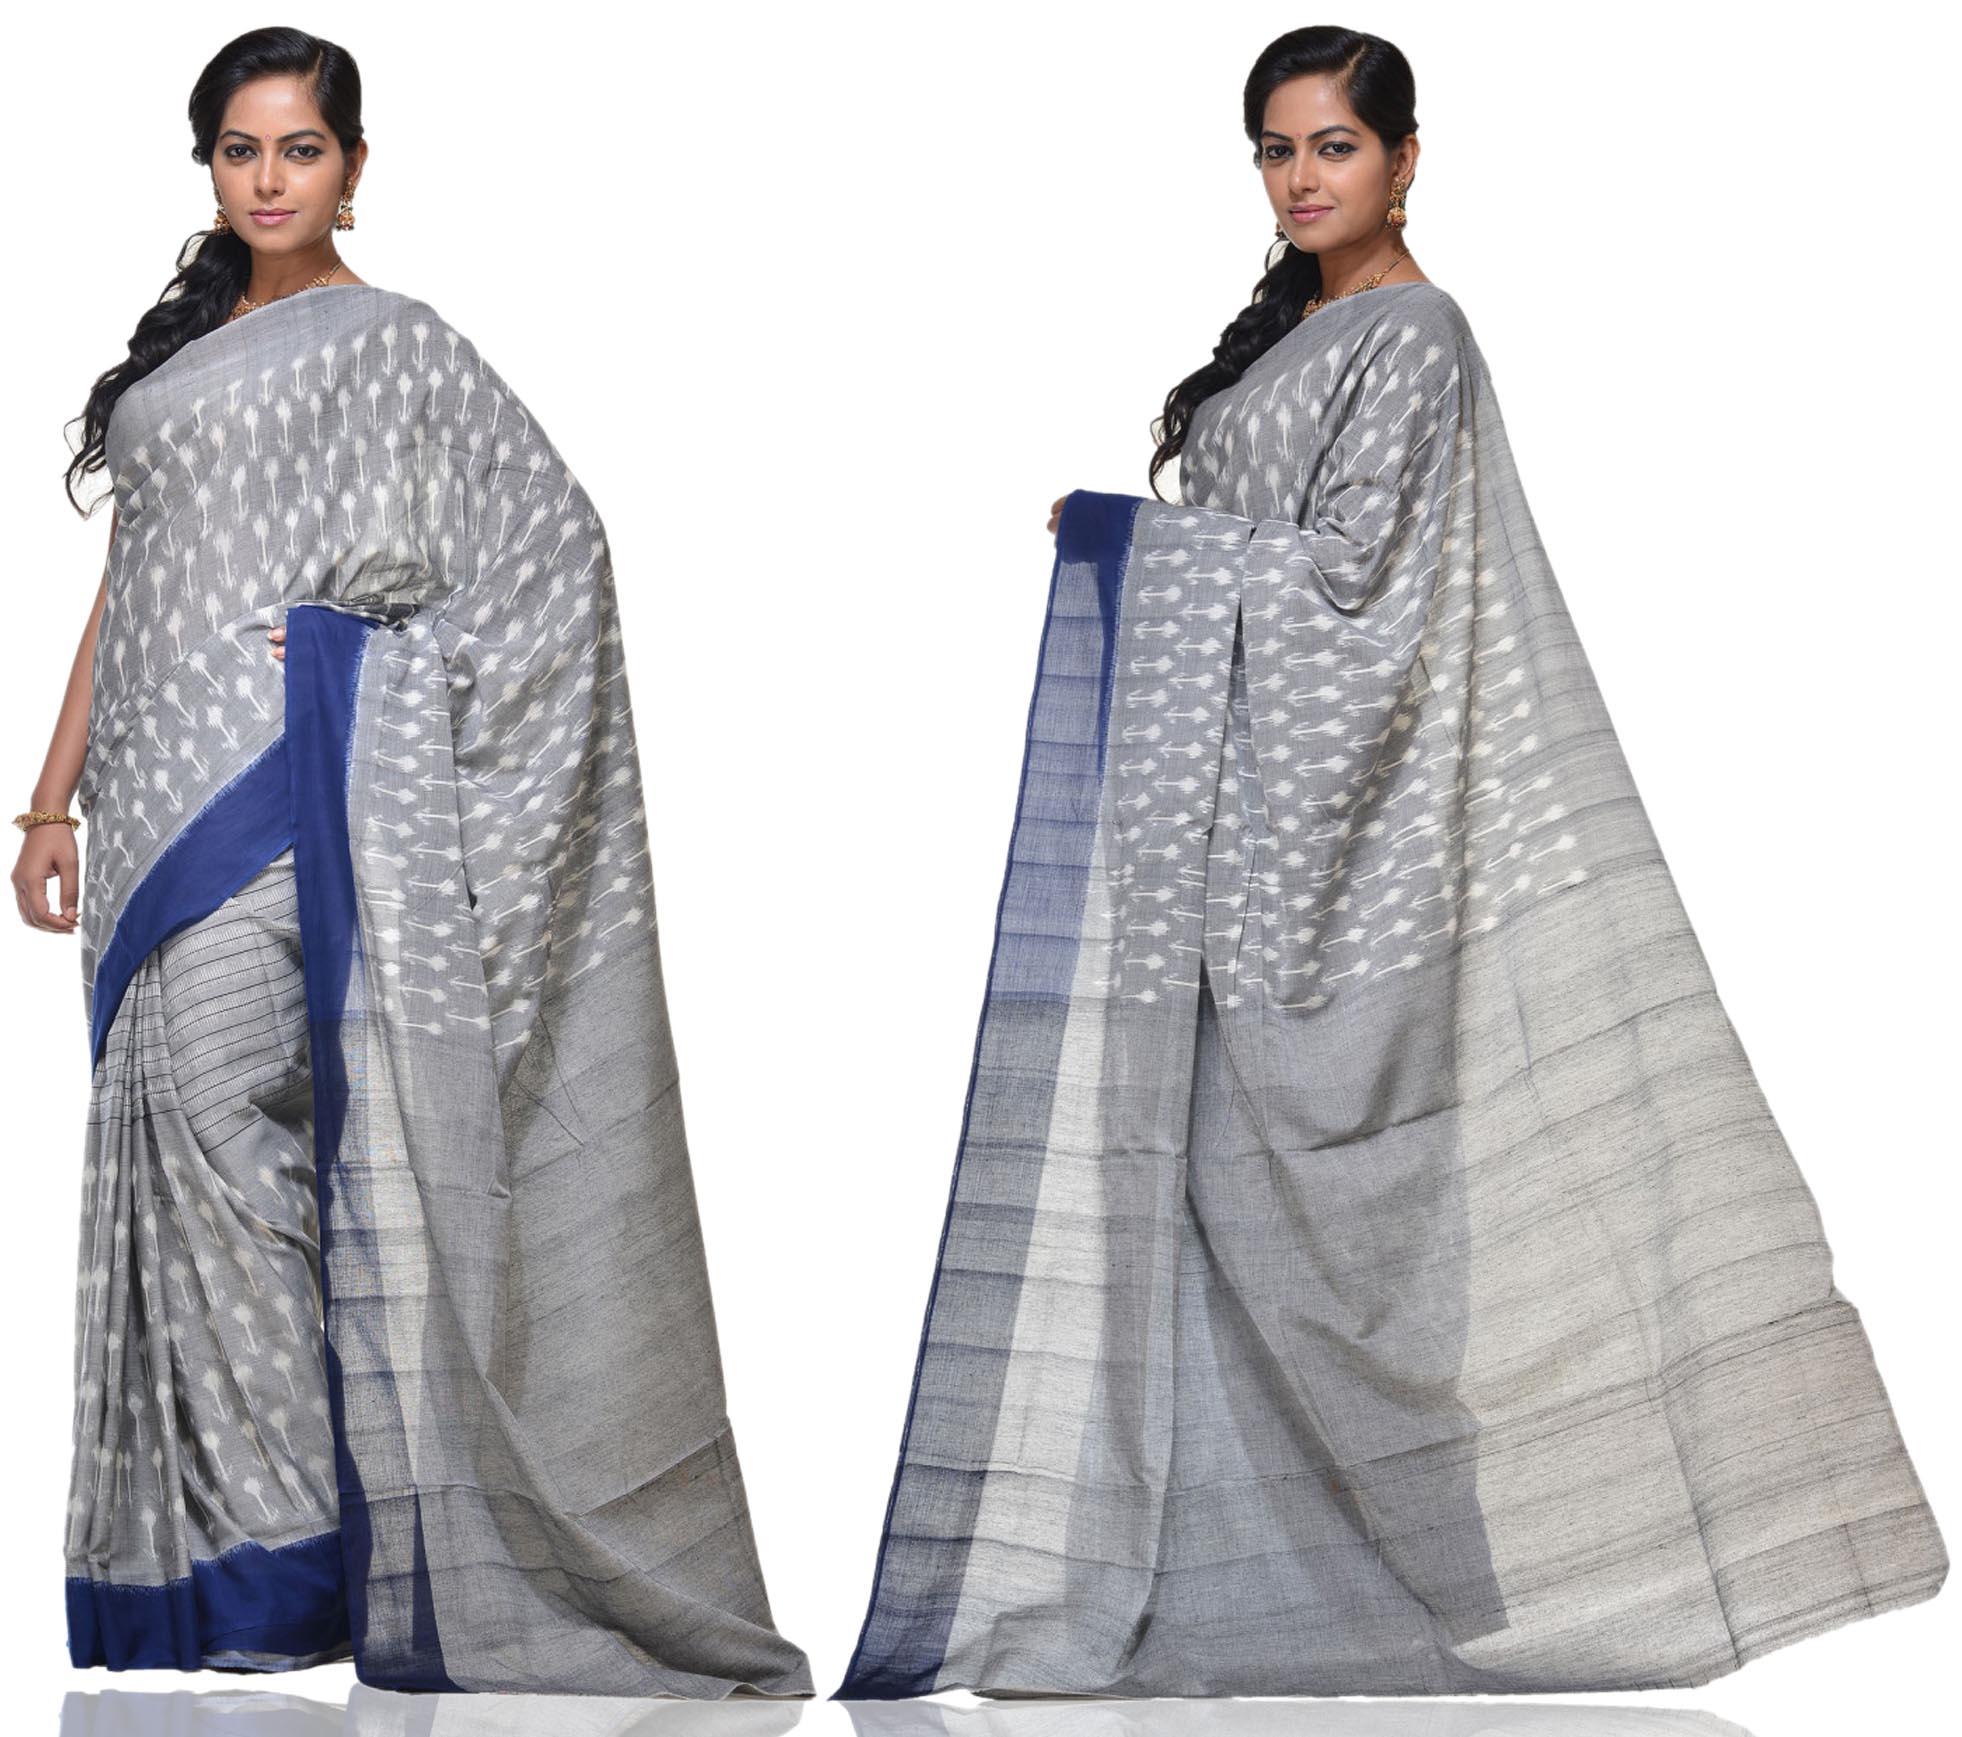 Price:- 4300/-   New collection of Ikkat sarees, ikkat Silk sarees, ikkat Cotton sarees, ikkat sarees. Sign up now for E-book you will be updated with latest collection of ethnic verities. For More Info Click on :- www.uppada.com  We manufacture of Uppada sarees, Paithani sarees, Banarasi sarees, Venkatagiri Sarees, Gadwal Sarees, Khadi sarees, Hand Painted Kalamkari Dupatta, Ikkat sarees, Kanchipuram Sarees, Atr Poly Silk Sarees, Dupattas, Stoles etc. For more info us at 040 64640303, 441905005.  Buy online: - uppada.com  - by Paithani, Hyderabad